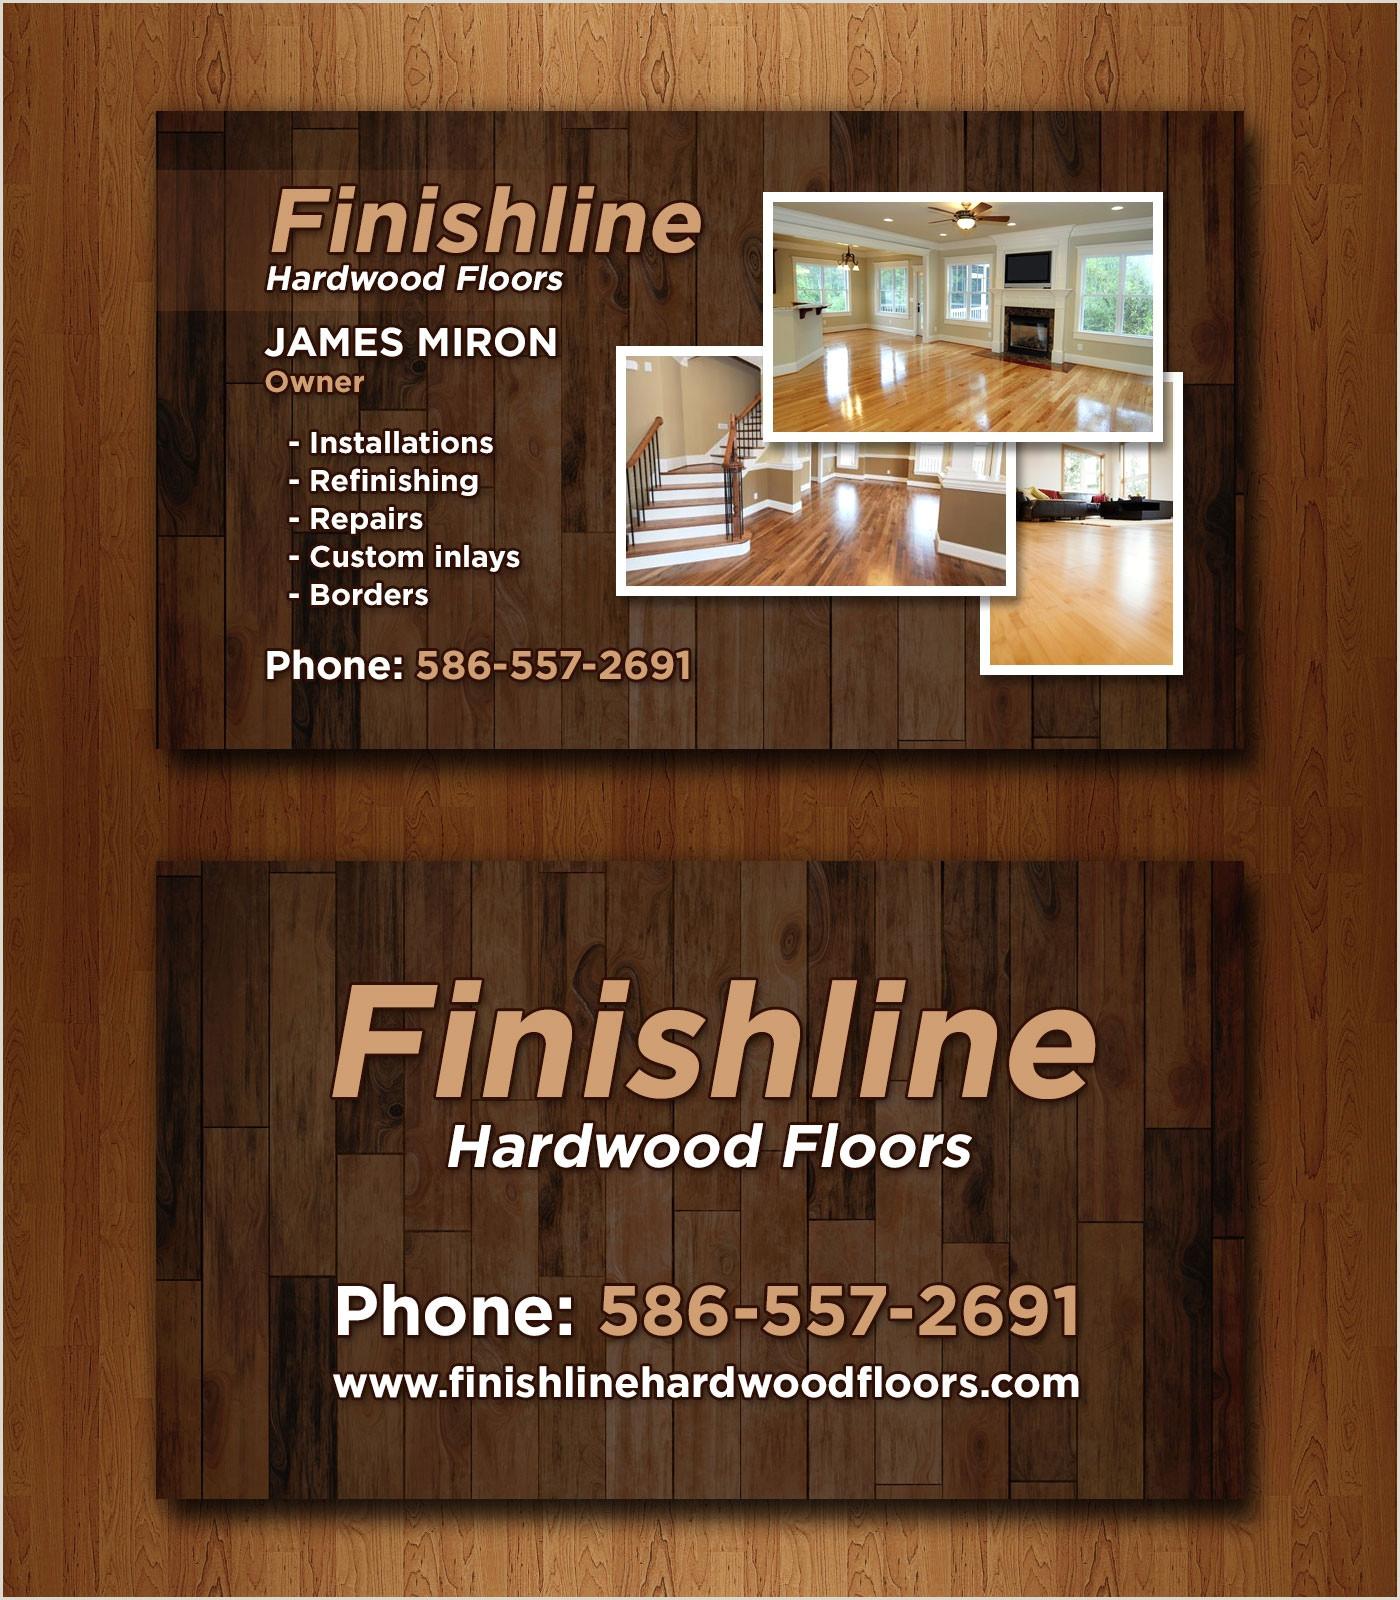 Good Business Card Design 14 Popular Hardwood Flooring Business Card Template